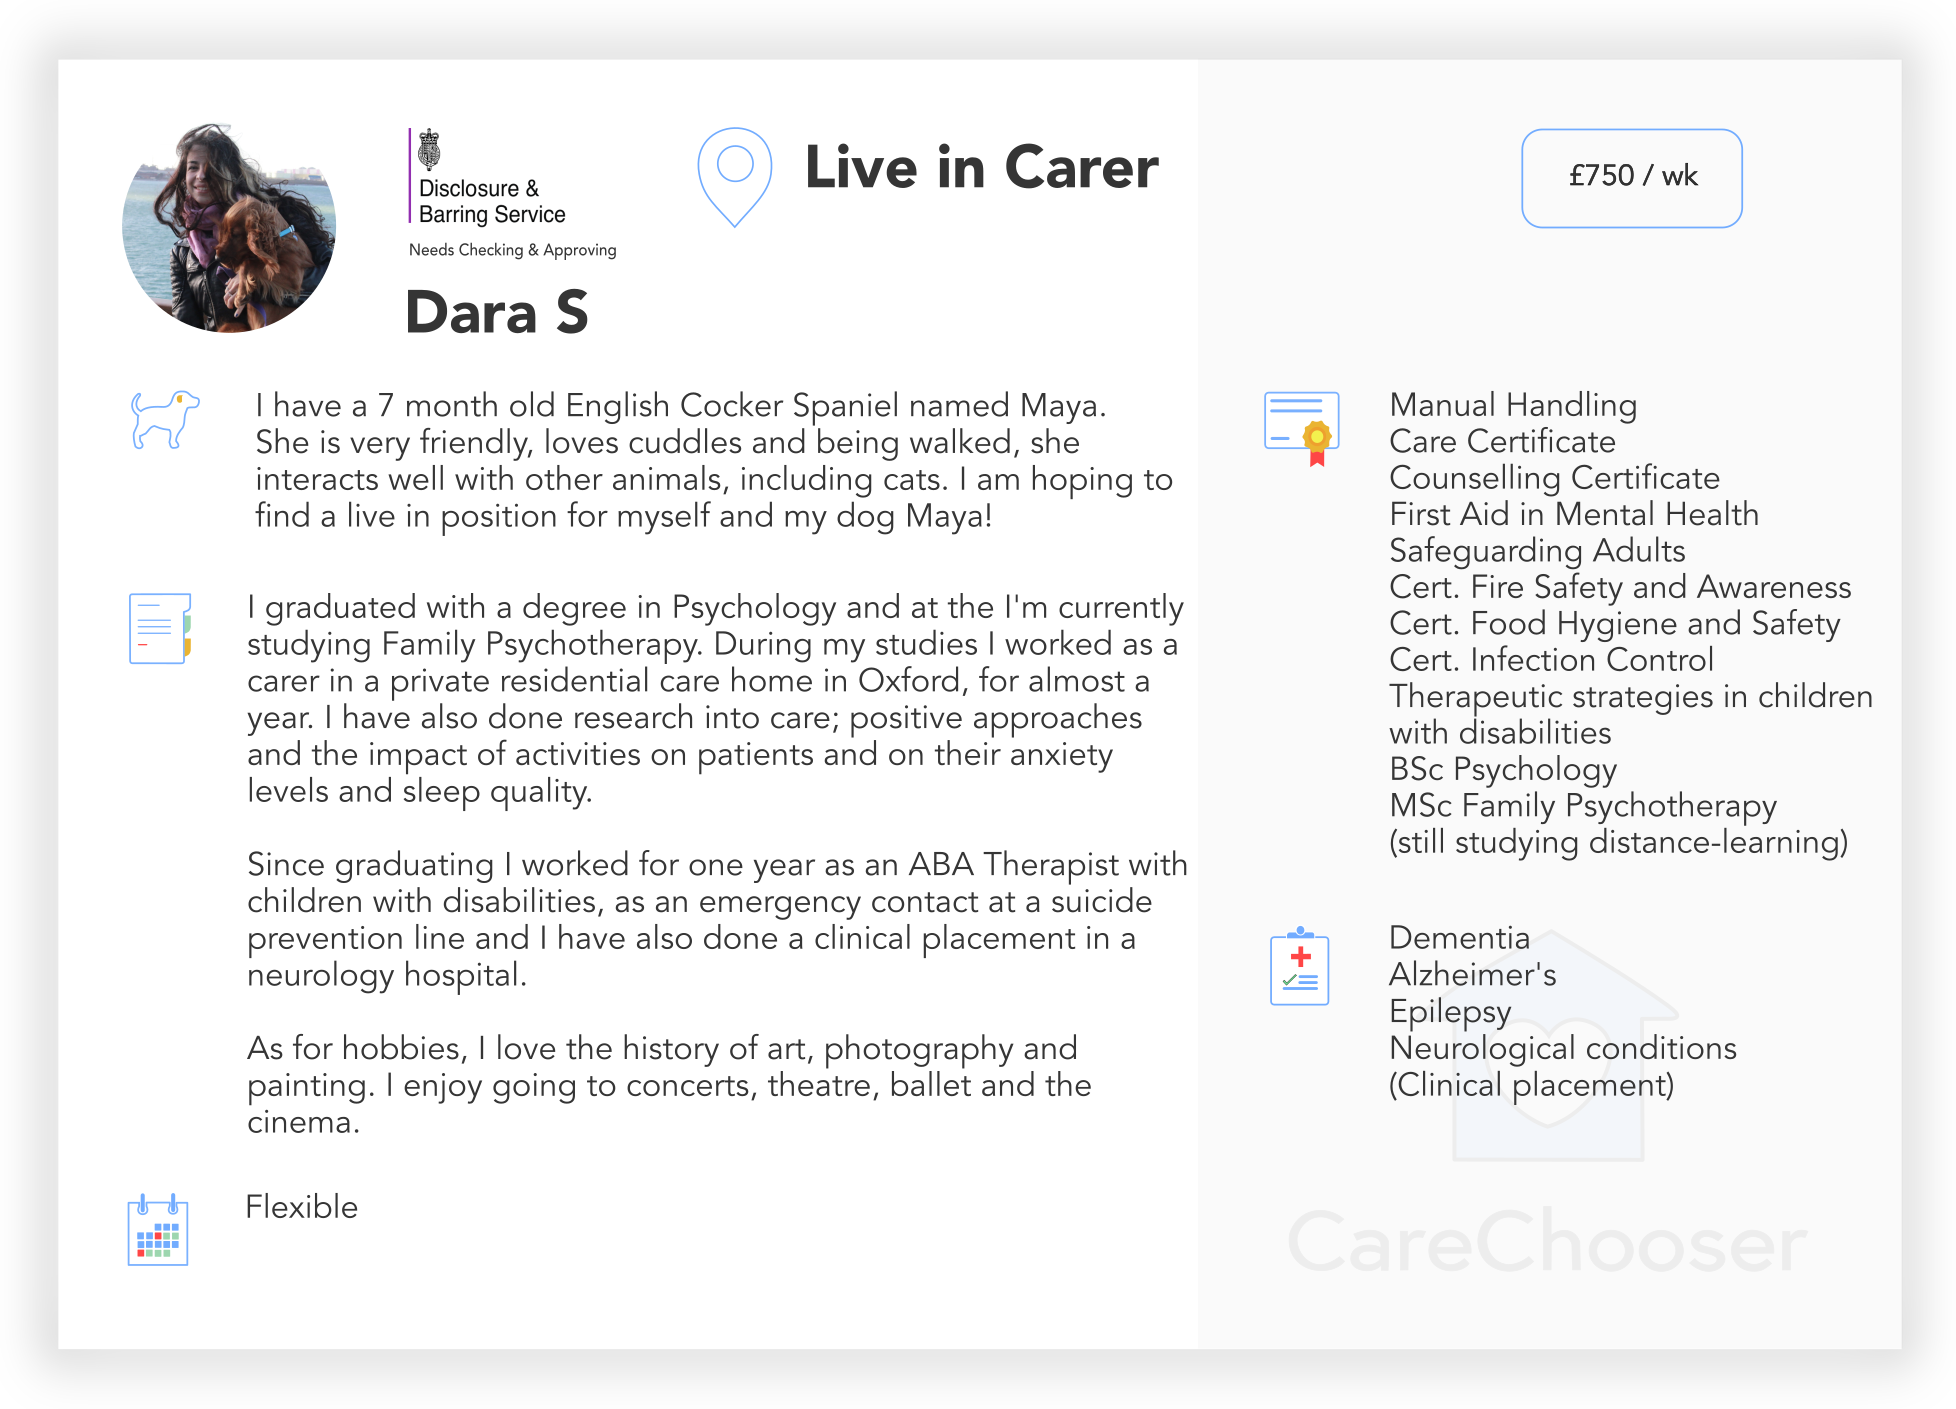 Dara - Live in care - Oxford.png